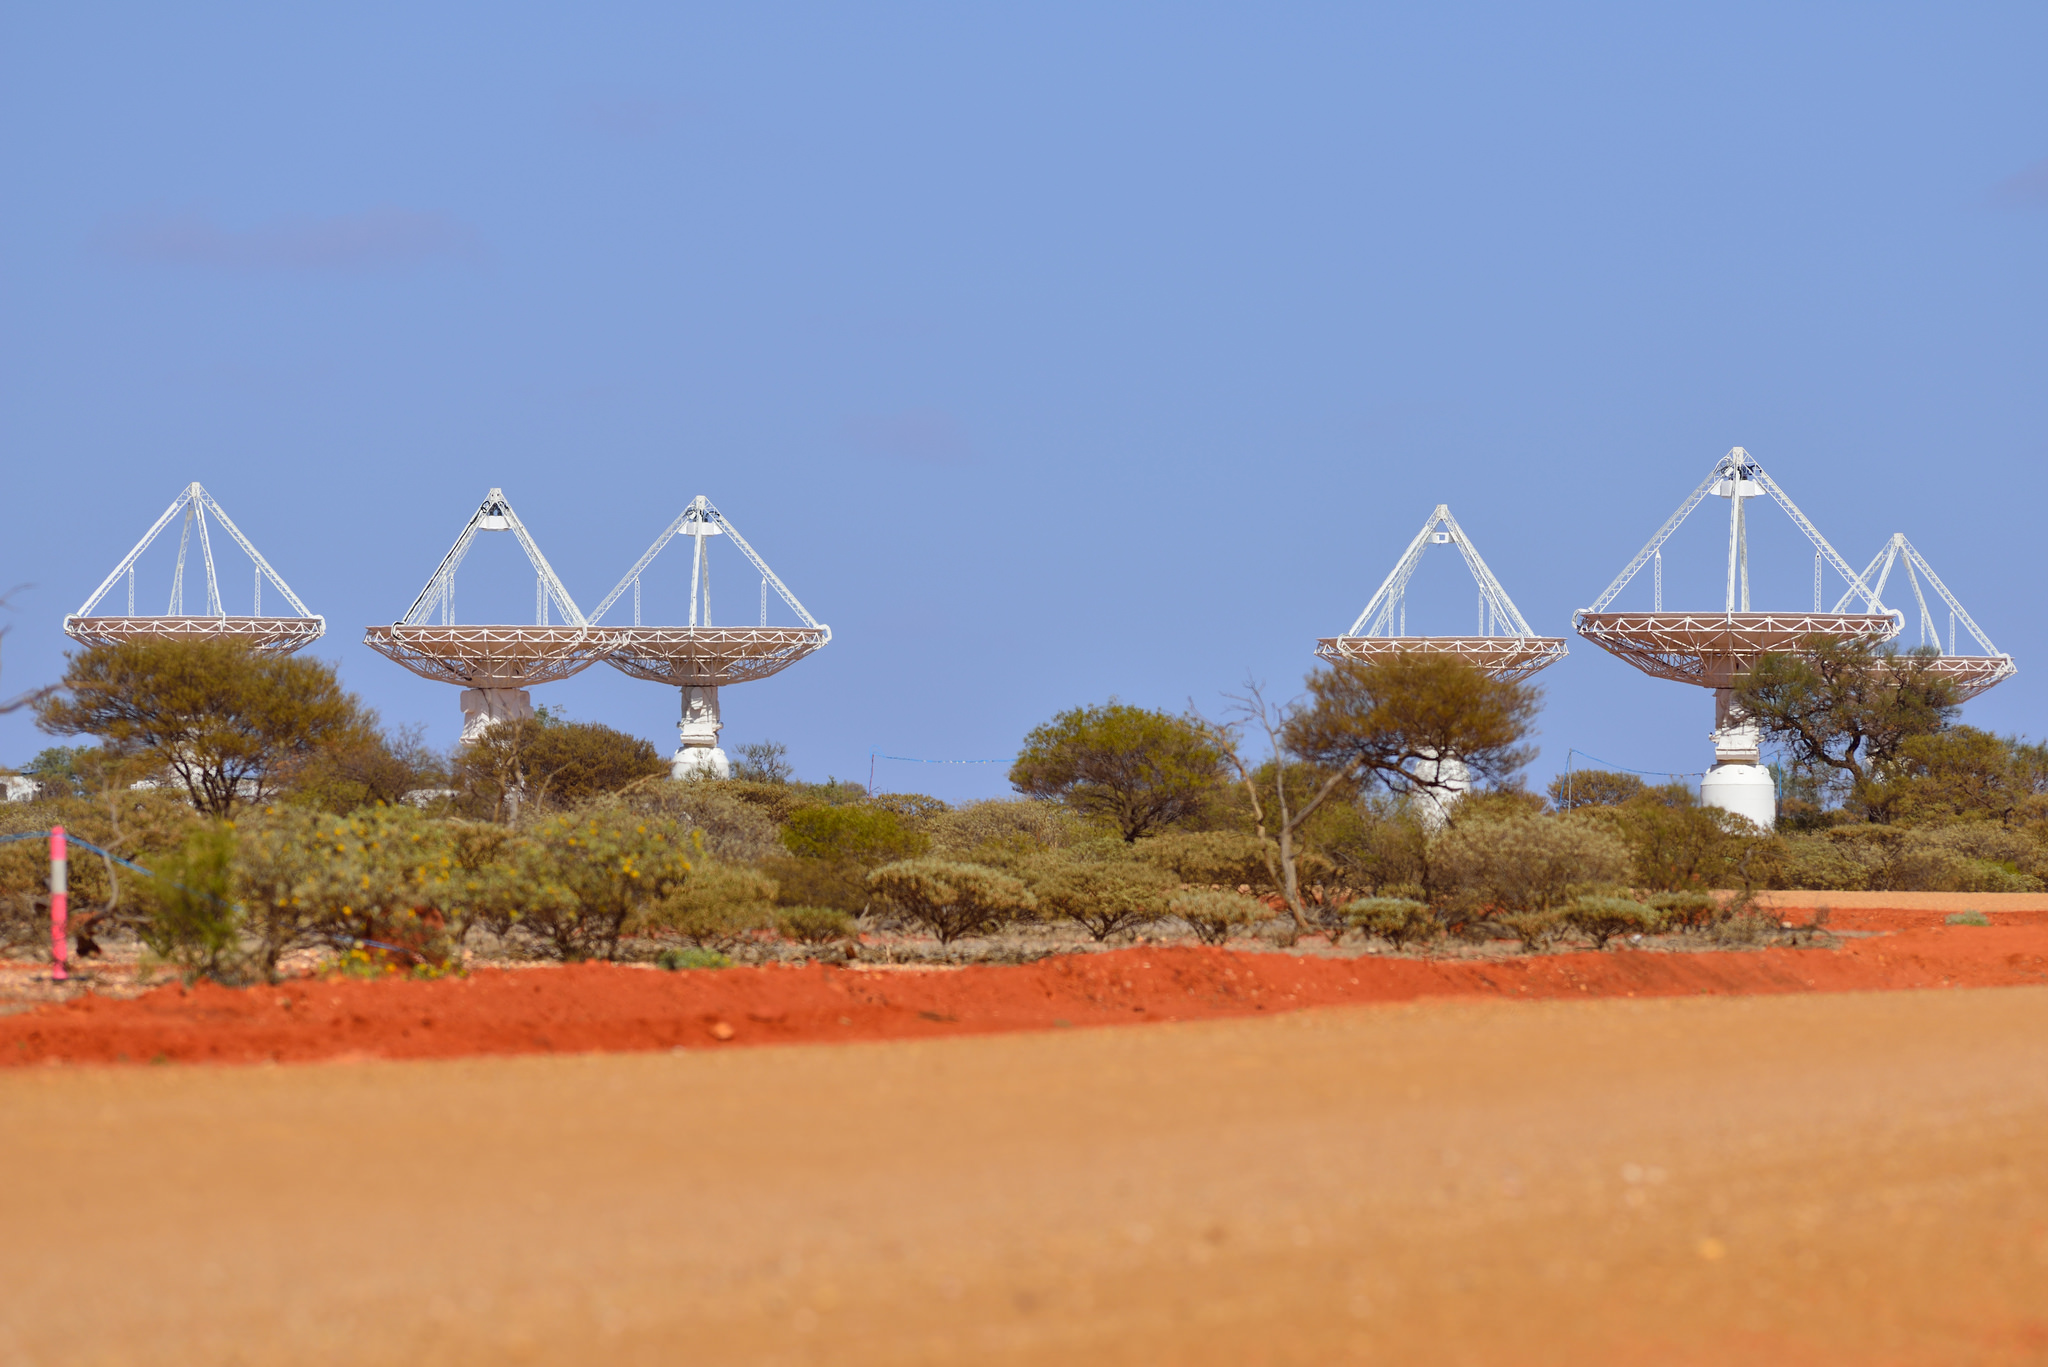 Part of CSIRO's ASKAP antennas at the Murchison Radio-astronomy Observatory (MRO) in Western Australia. - Image Credit: Australian SKA Office/WA Department of Commerce ,